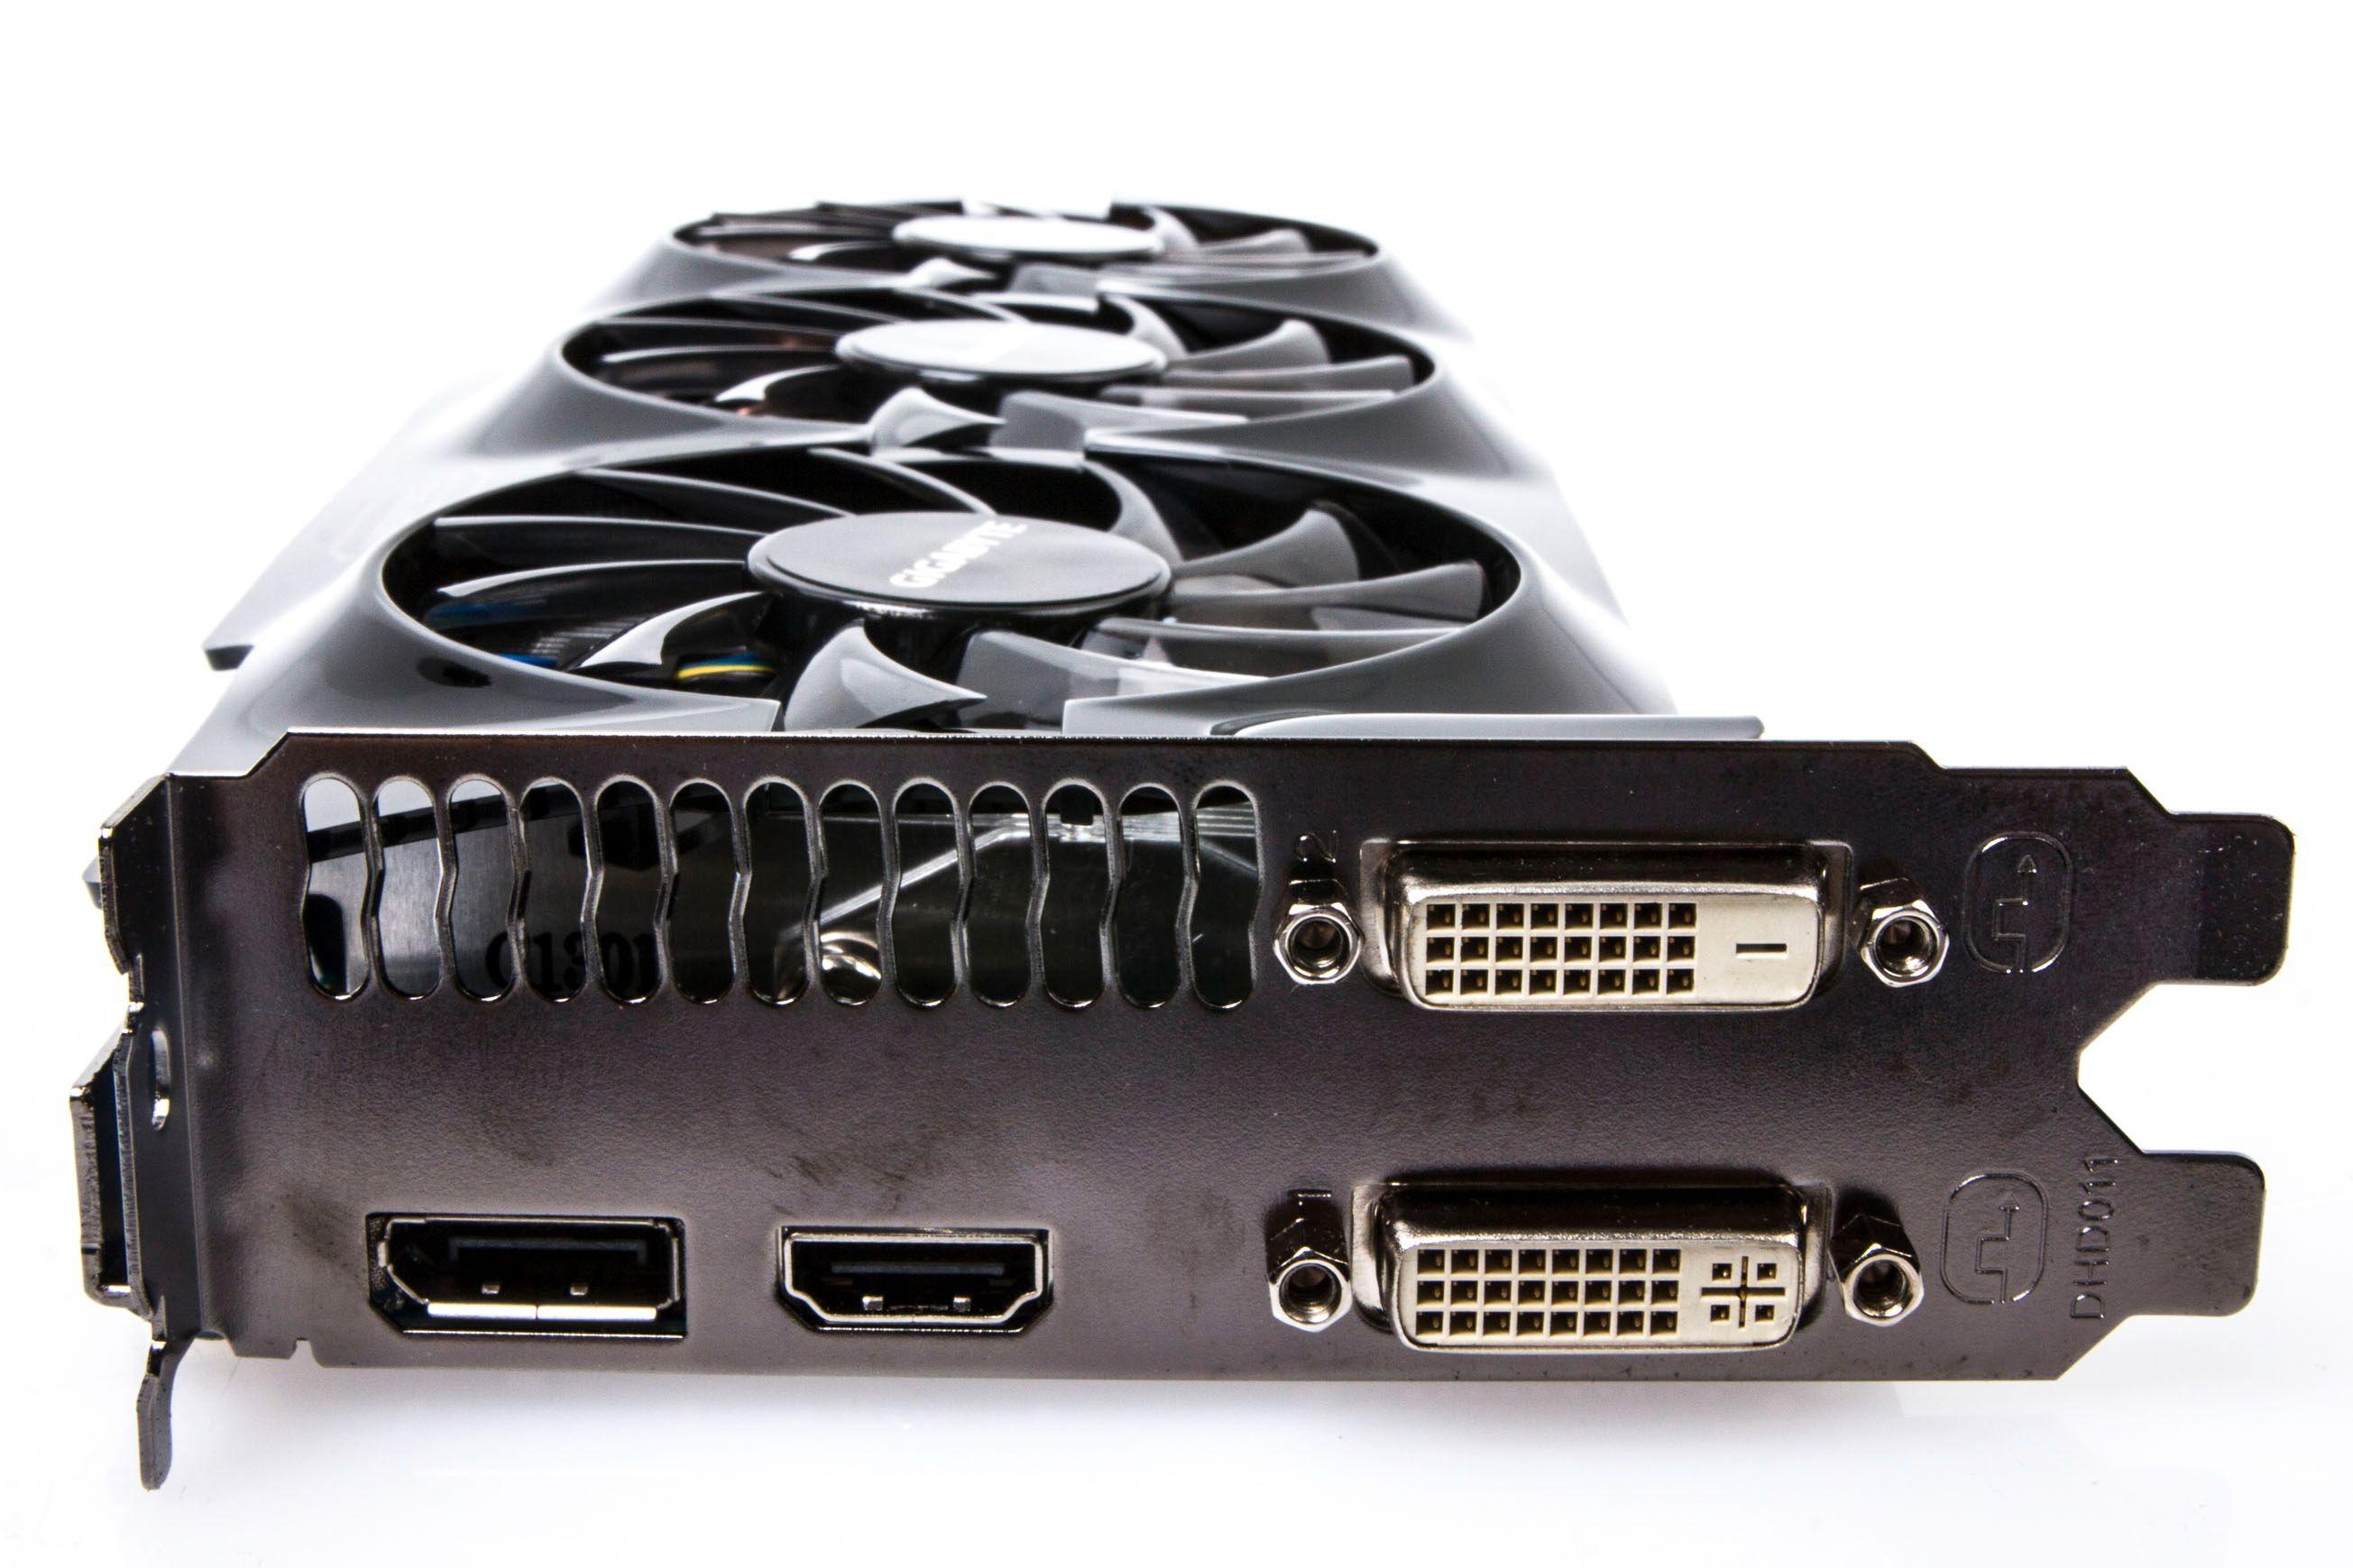 Gigabyte GeForce GTX 780 Windforce 3X 4 GB.Foto: Varg Aamo, Hardware.no